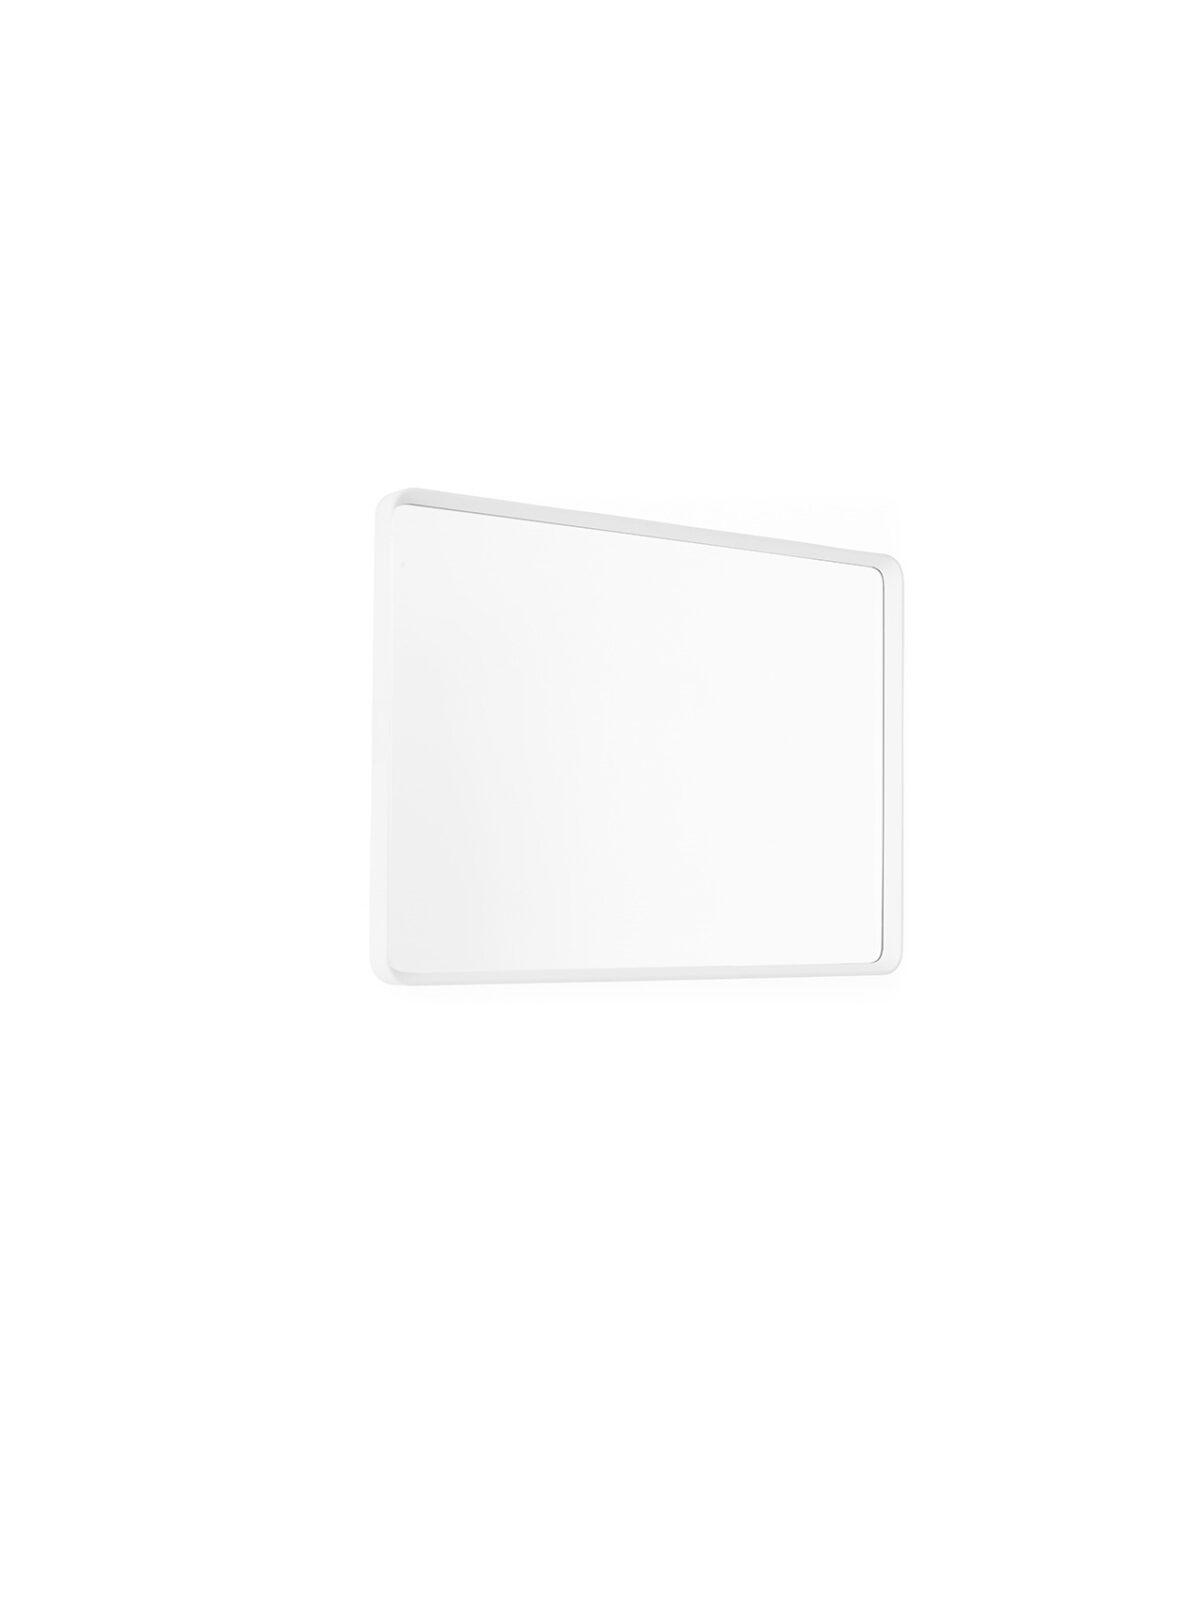 8020639 Norm Mirror Rectangular White2019 06 25 10 39 05 174